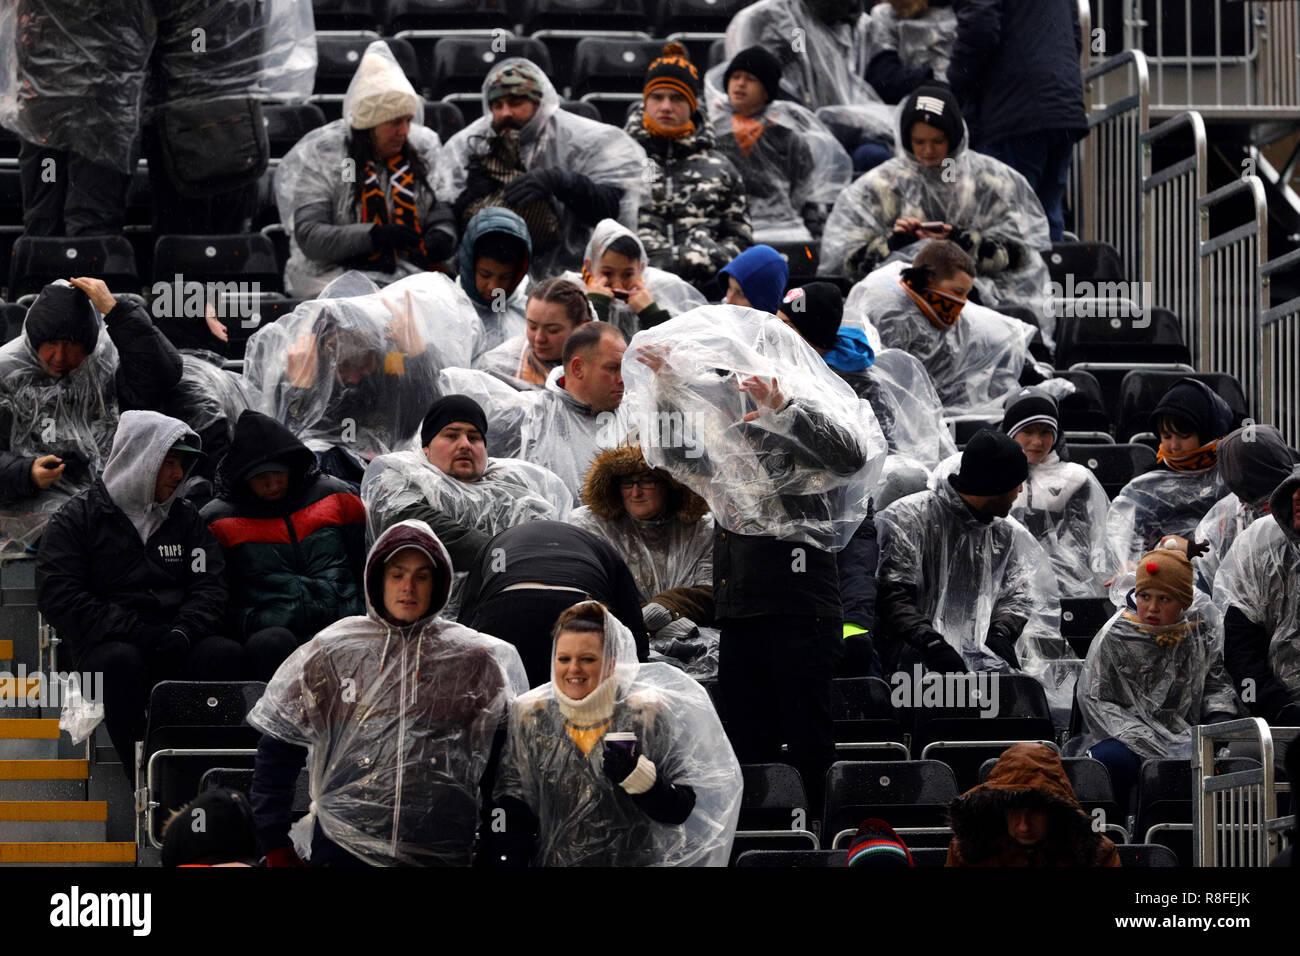 Rain Football Fans Stock Photos & Rain Football Fans Stock